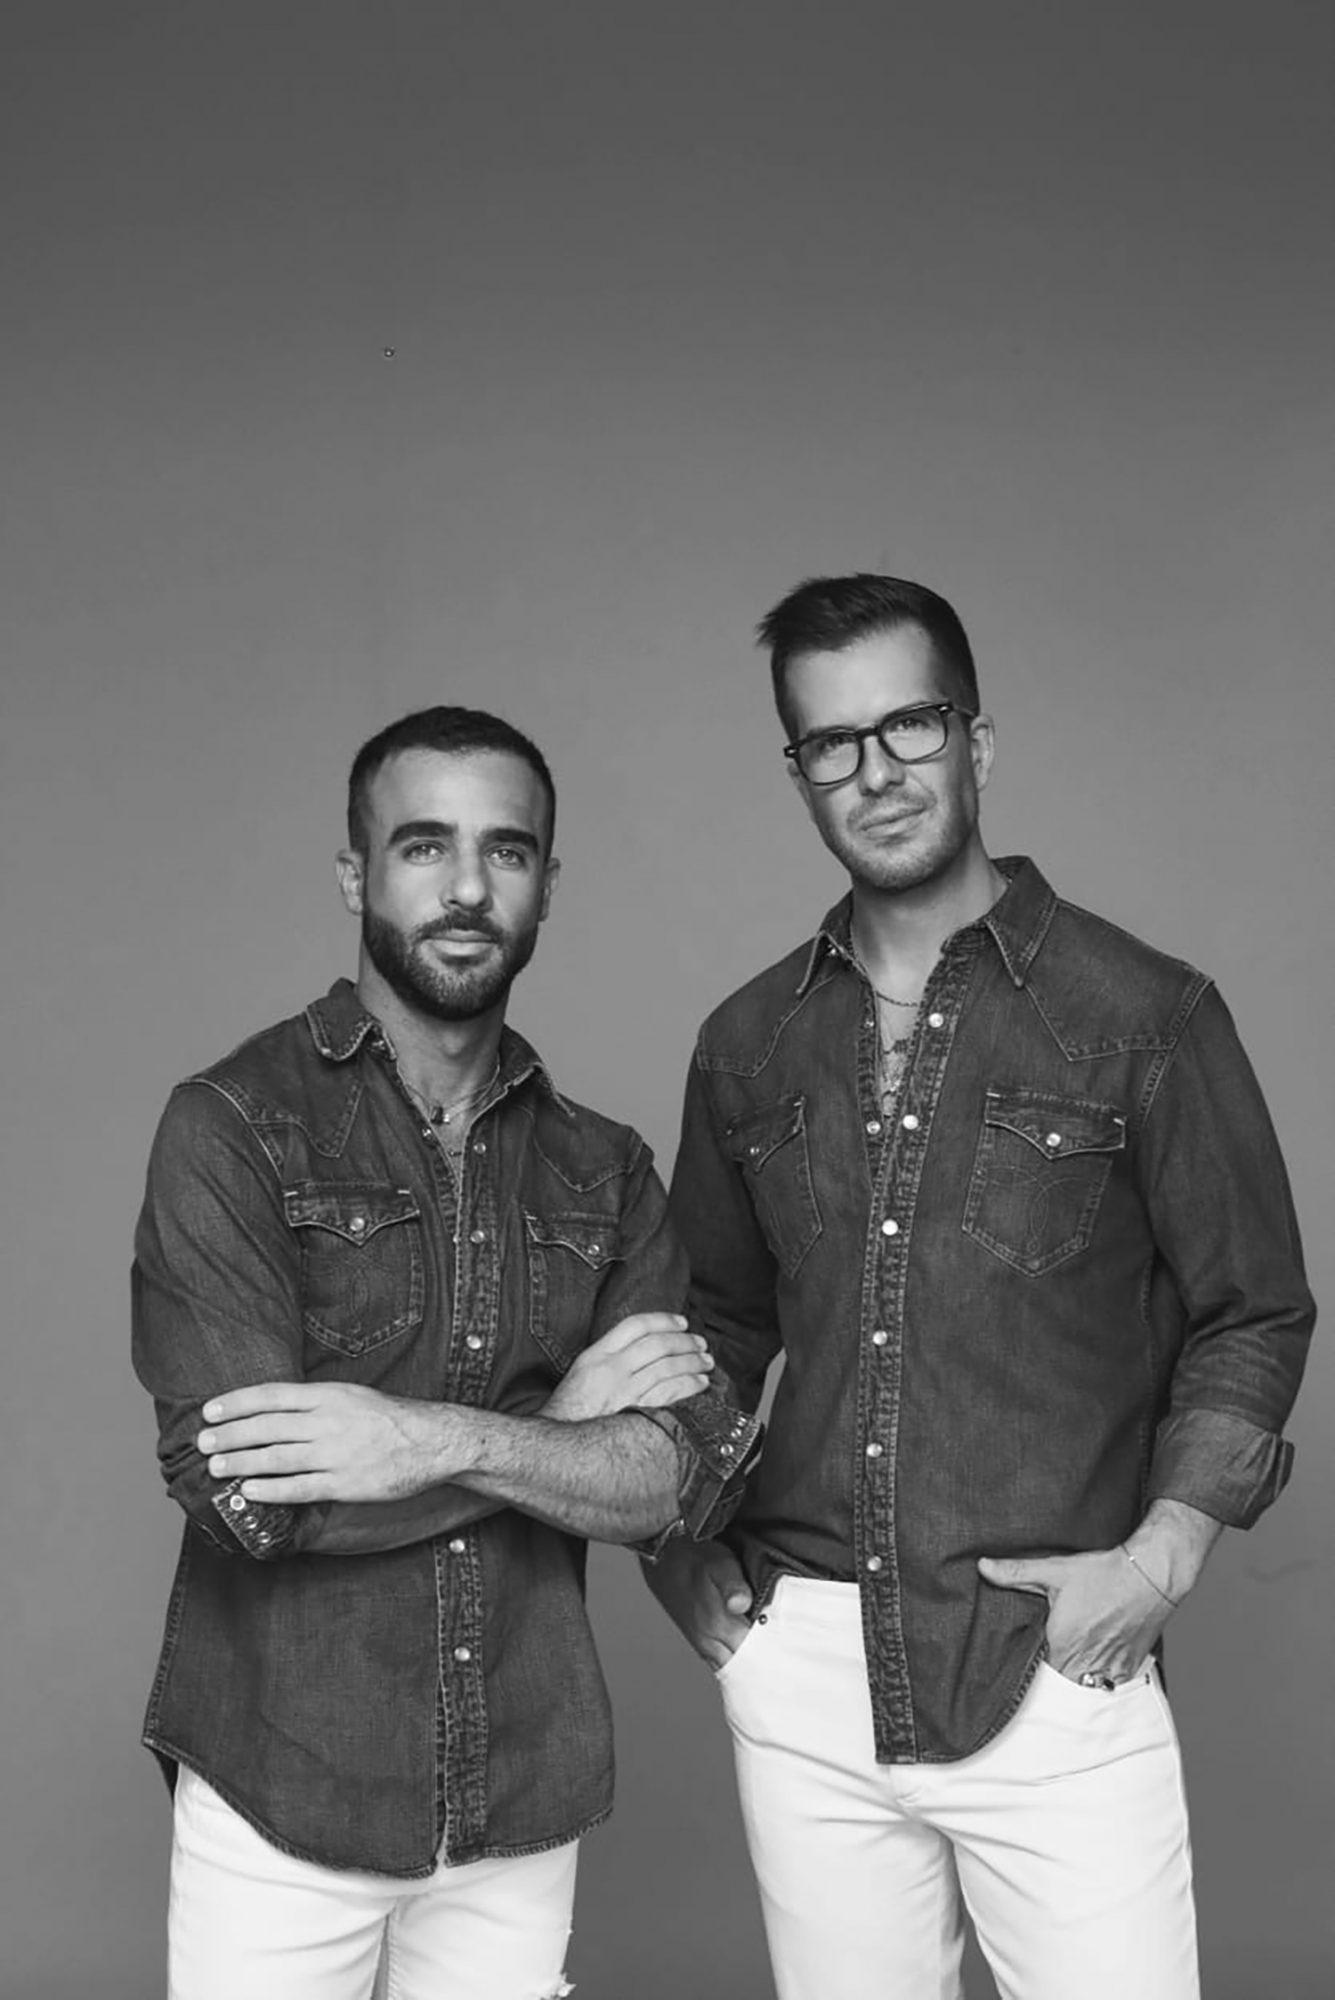 Jaime González y Alfonso Helfon - - Boda Ninel Conde y Larry Ramos